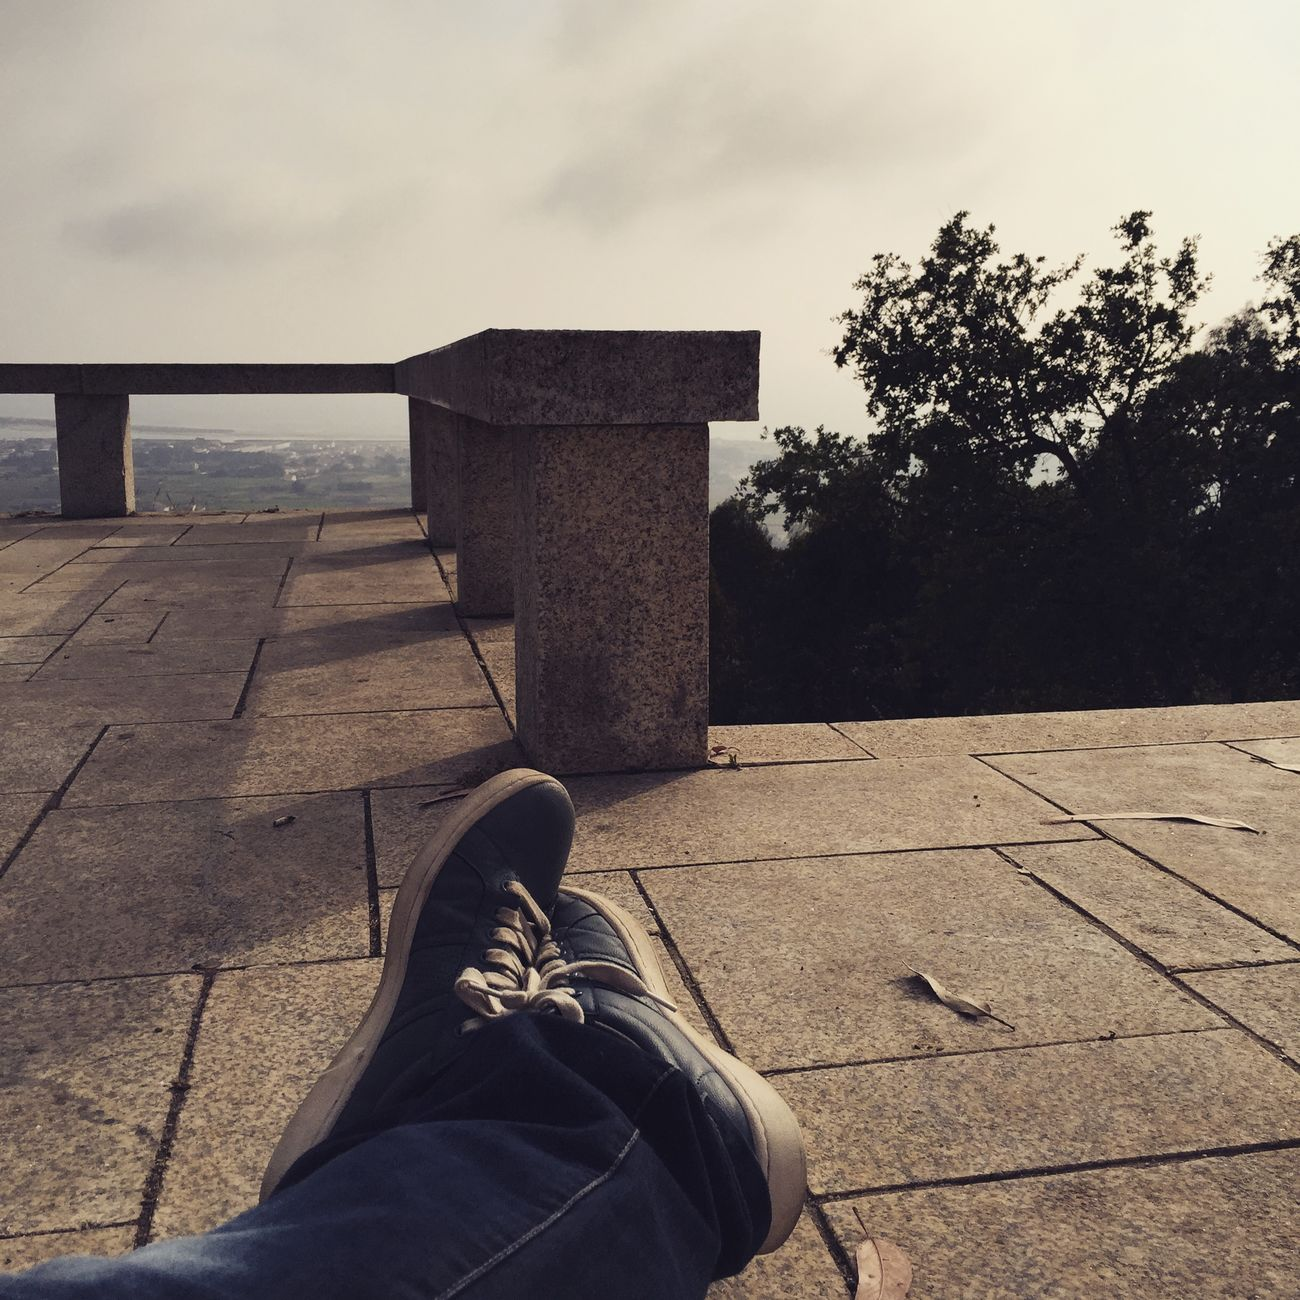 Just sit, breathe and enjoy your life. EyeEm Nature Lover EyeEm Best Shots Eye4photography  Enjoying Life Nature